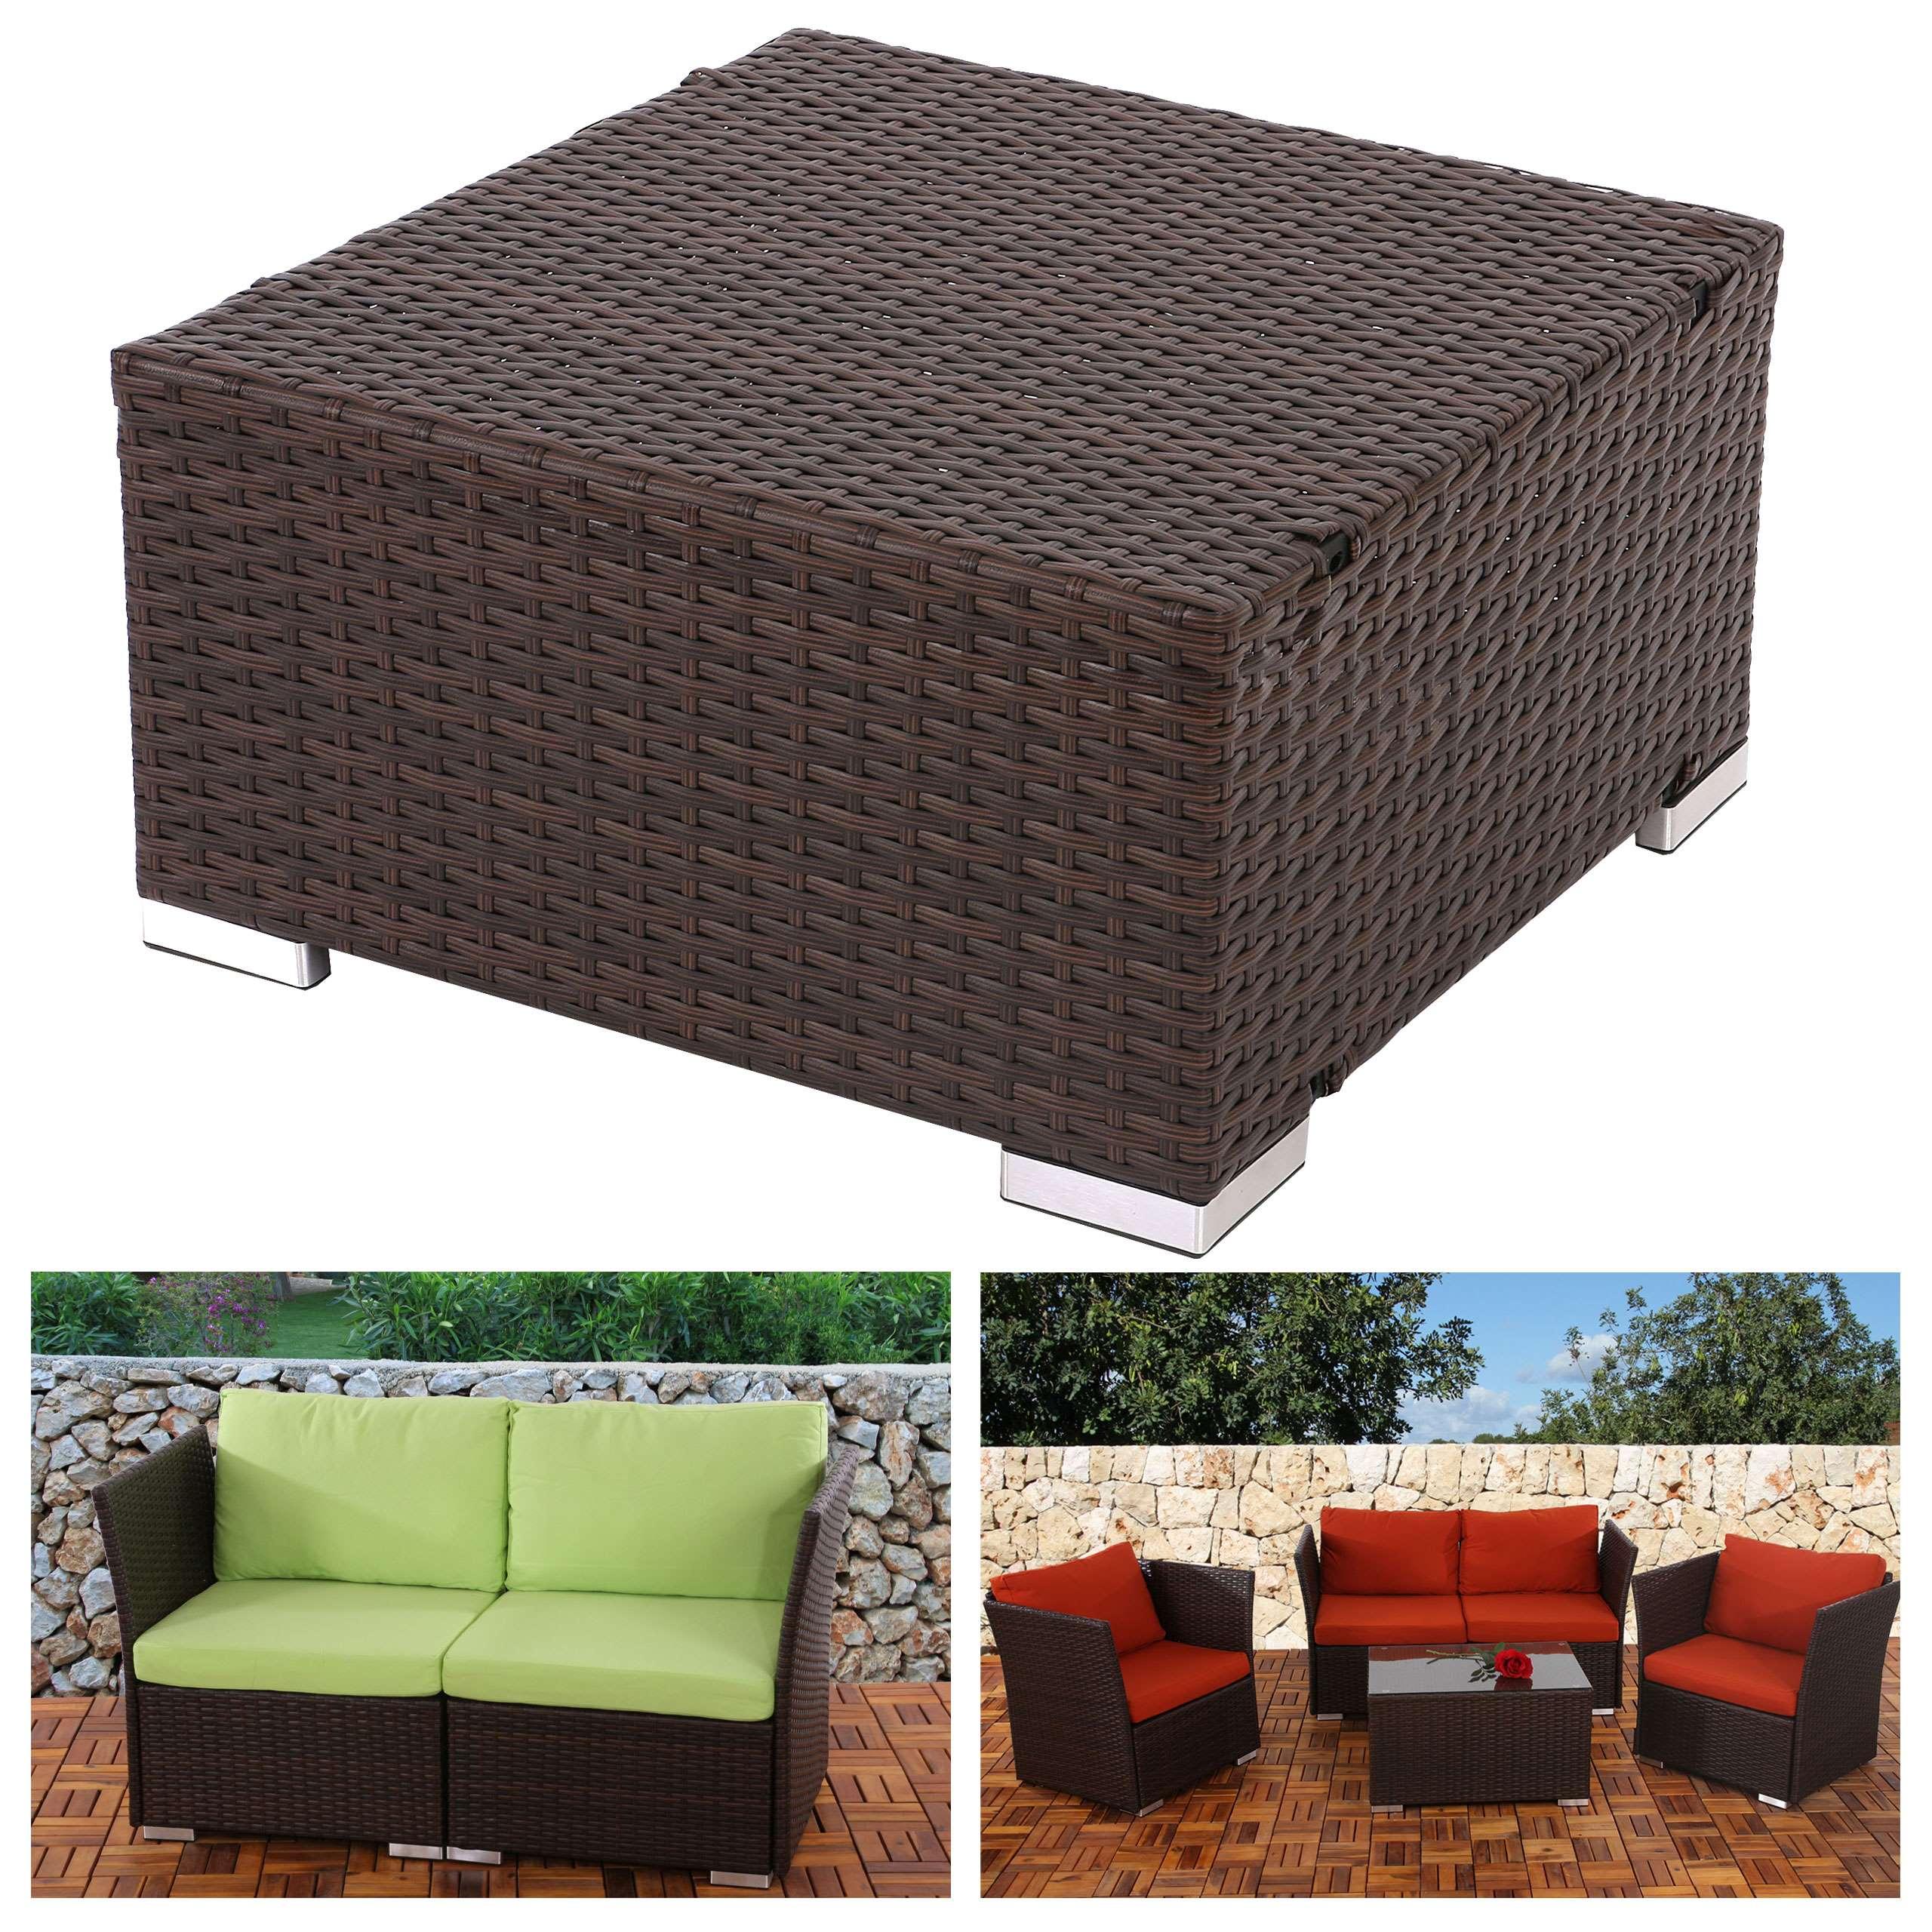 Poly rattan sofa siena modulare gastronomie qualit t naturgrau grau braun ebay Rattan sofa grau